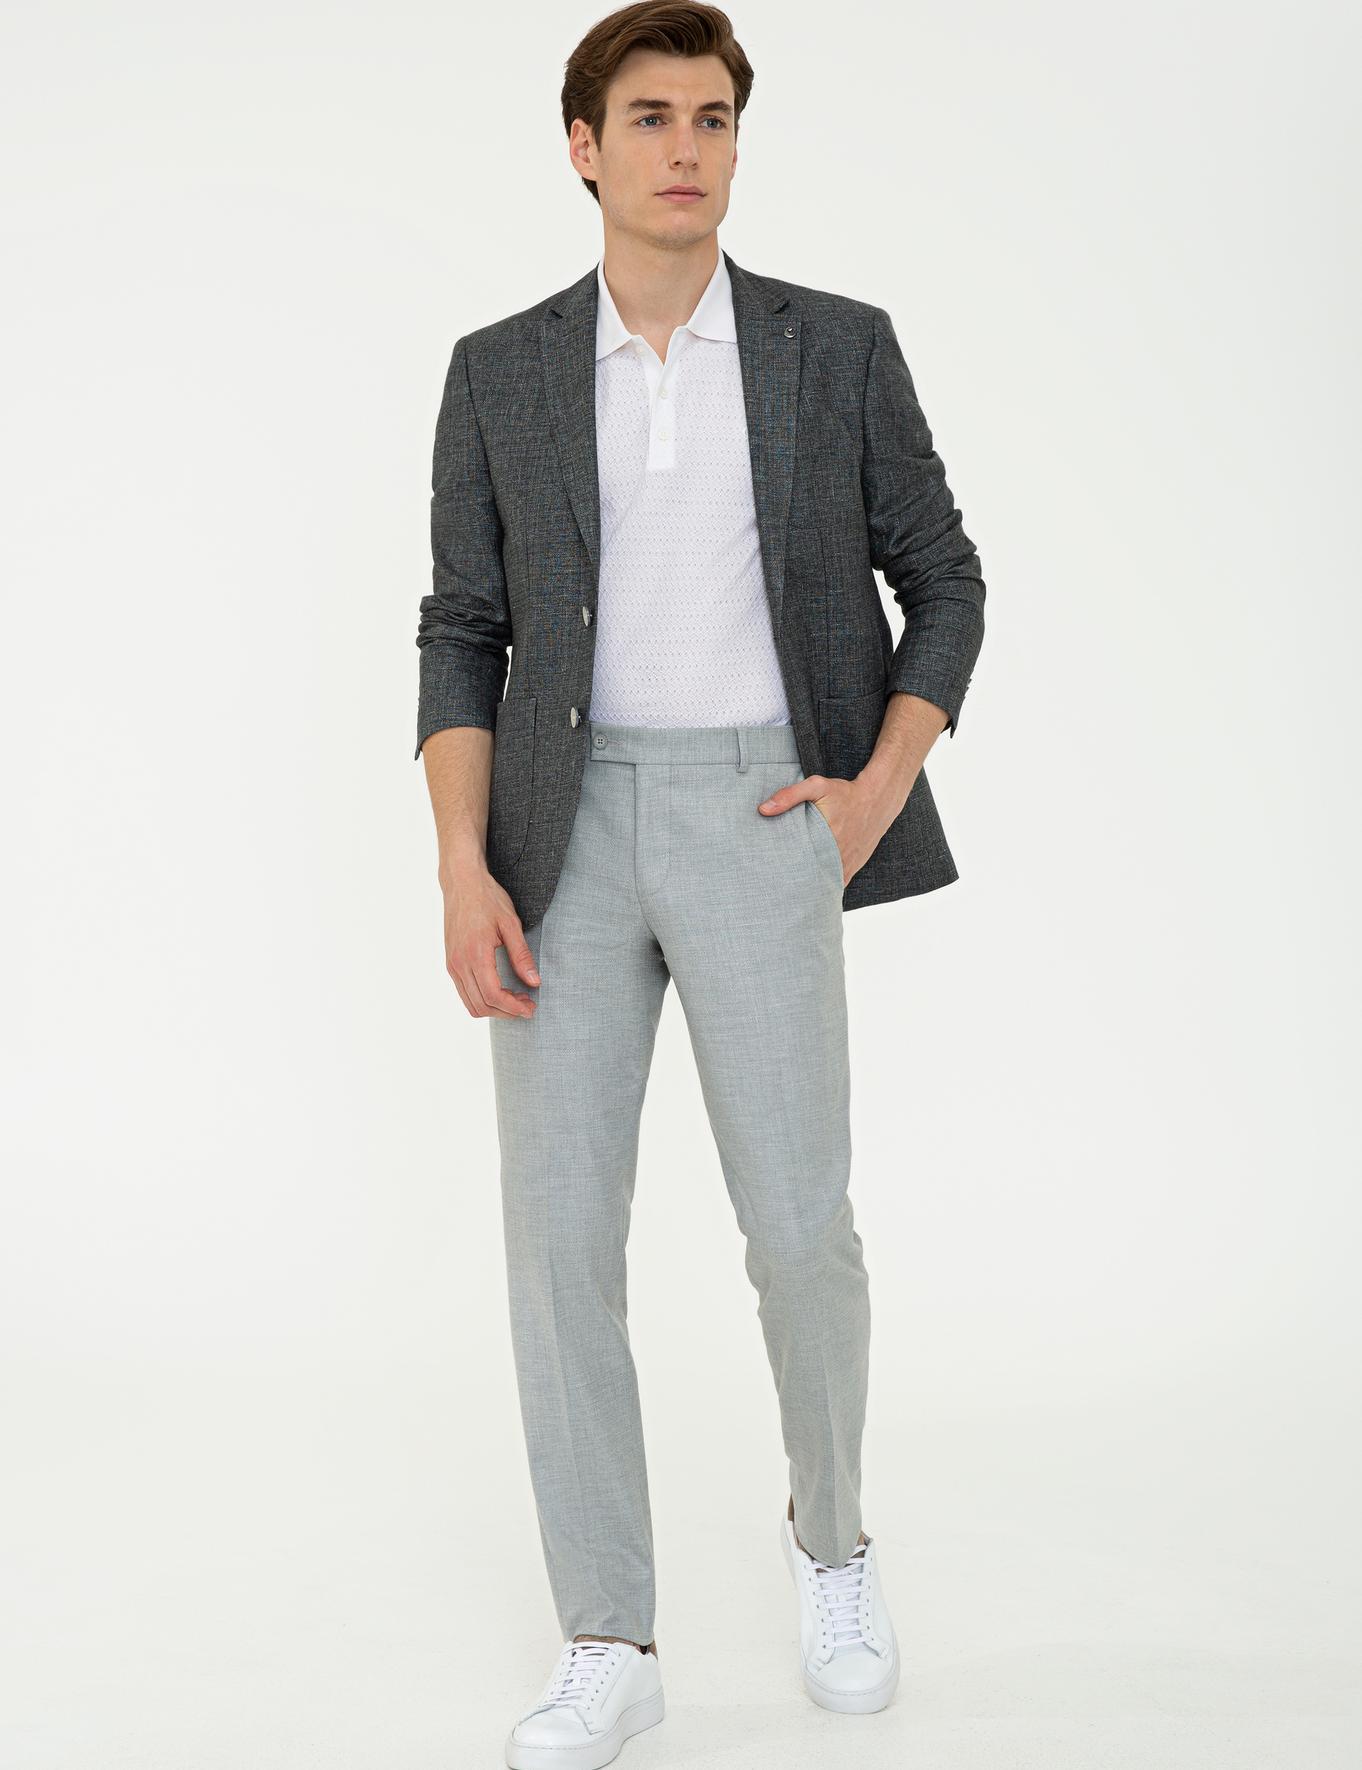 Siyah Slim Fit Ceket - 50233107116